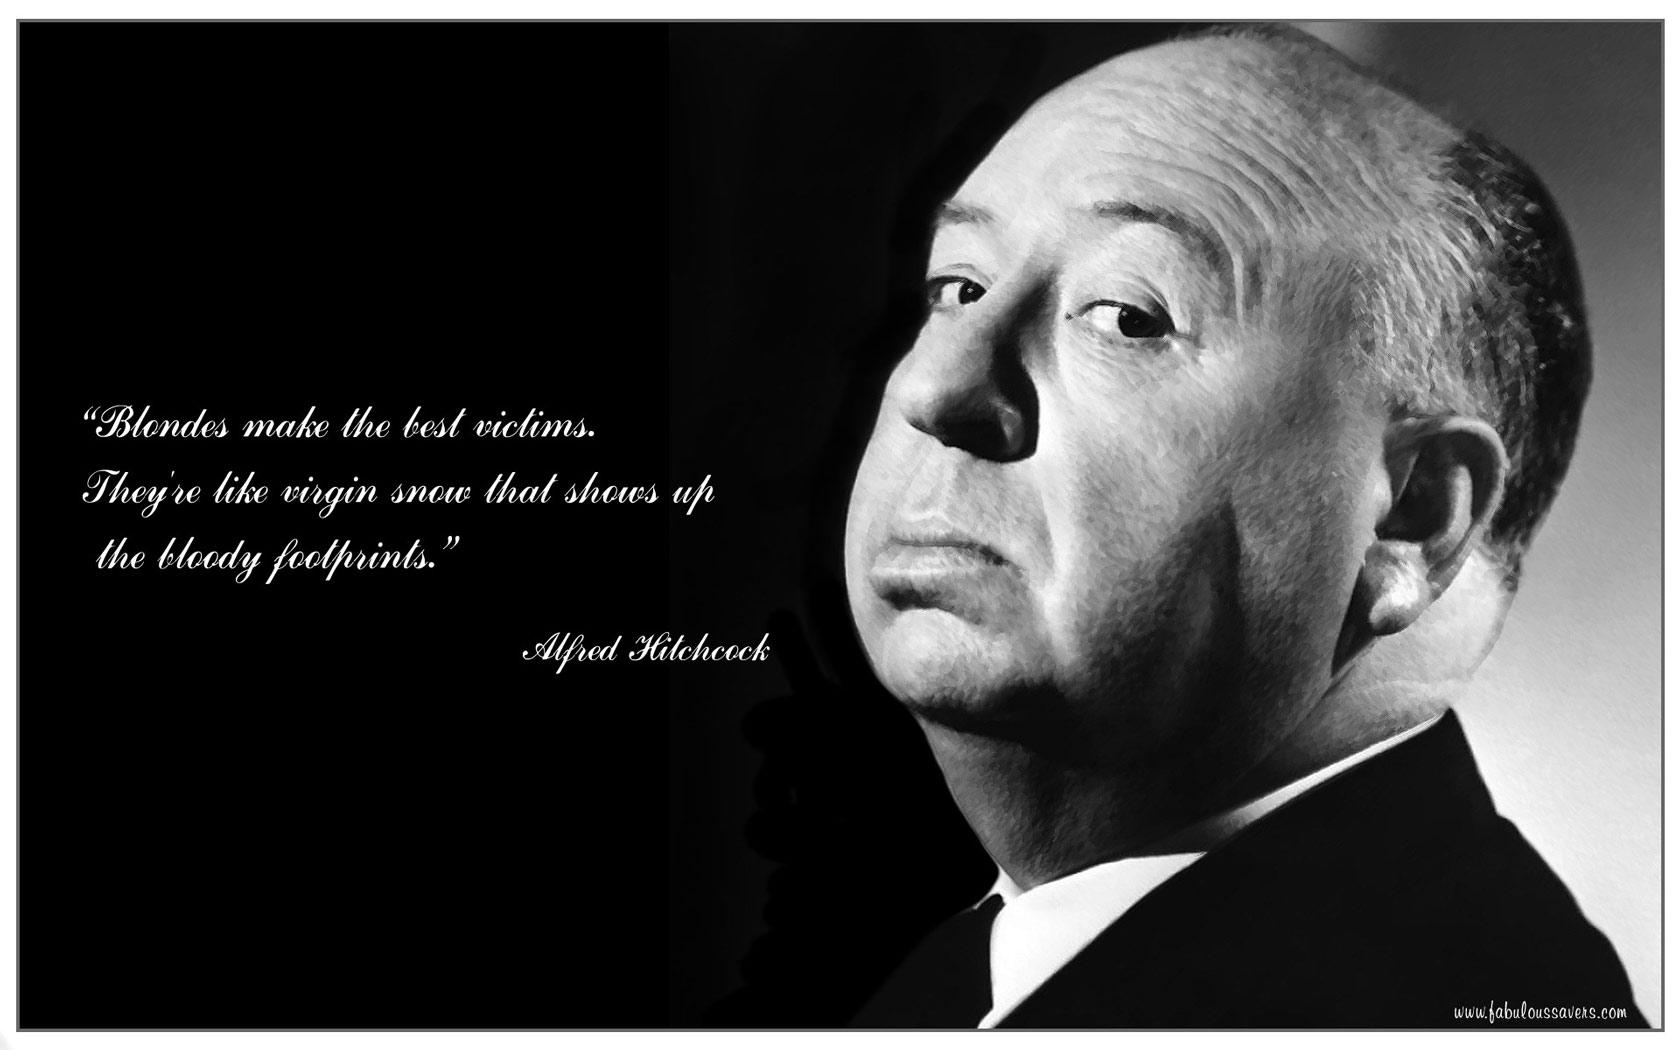 76] Alfred Hitchcock Wallpaper on WallpaperSafari 1680x1050